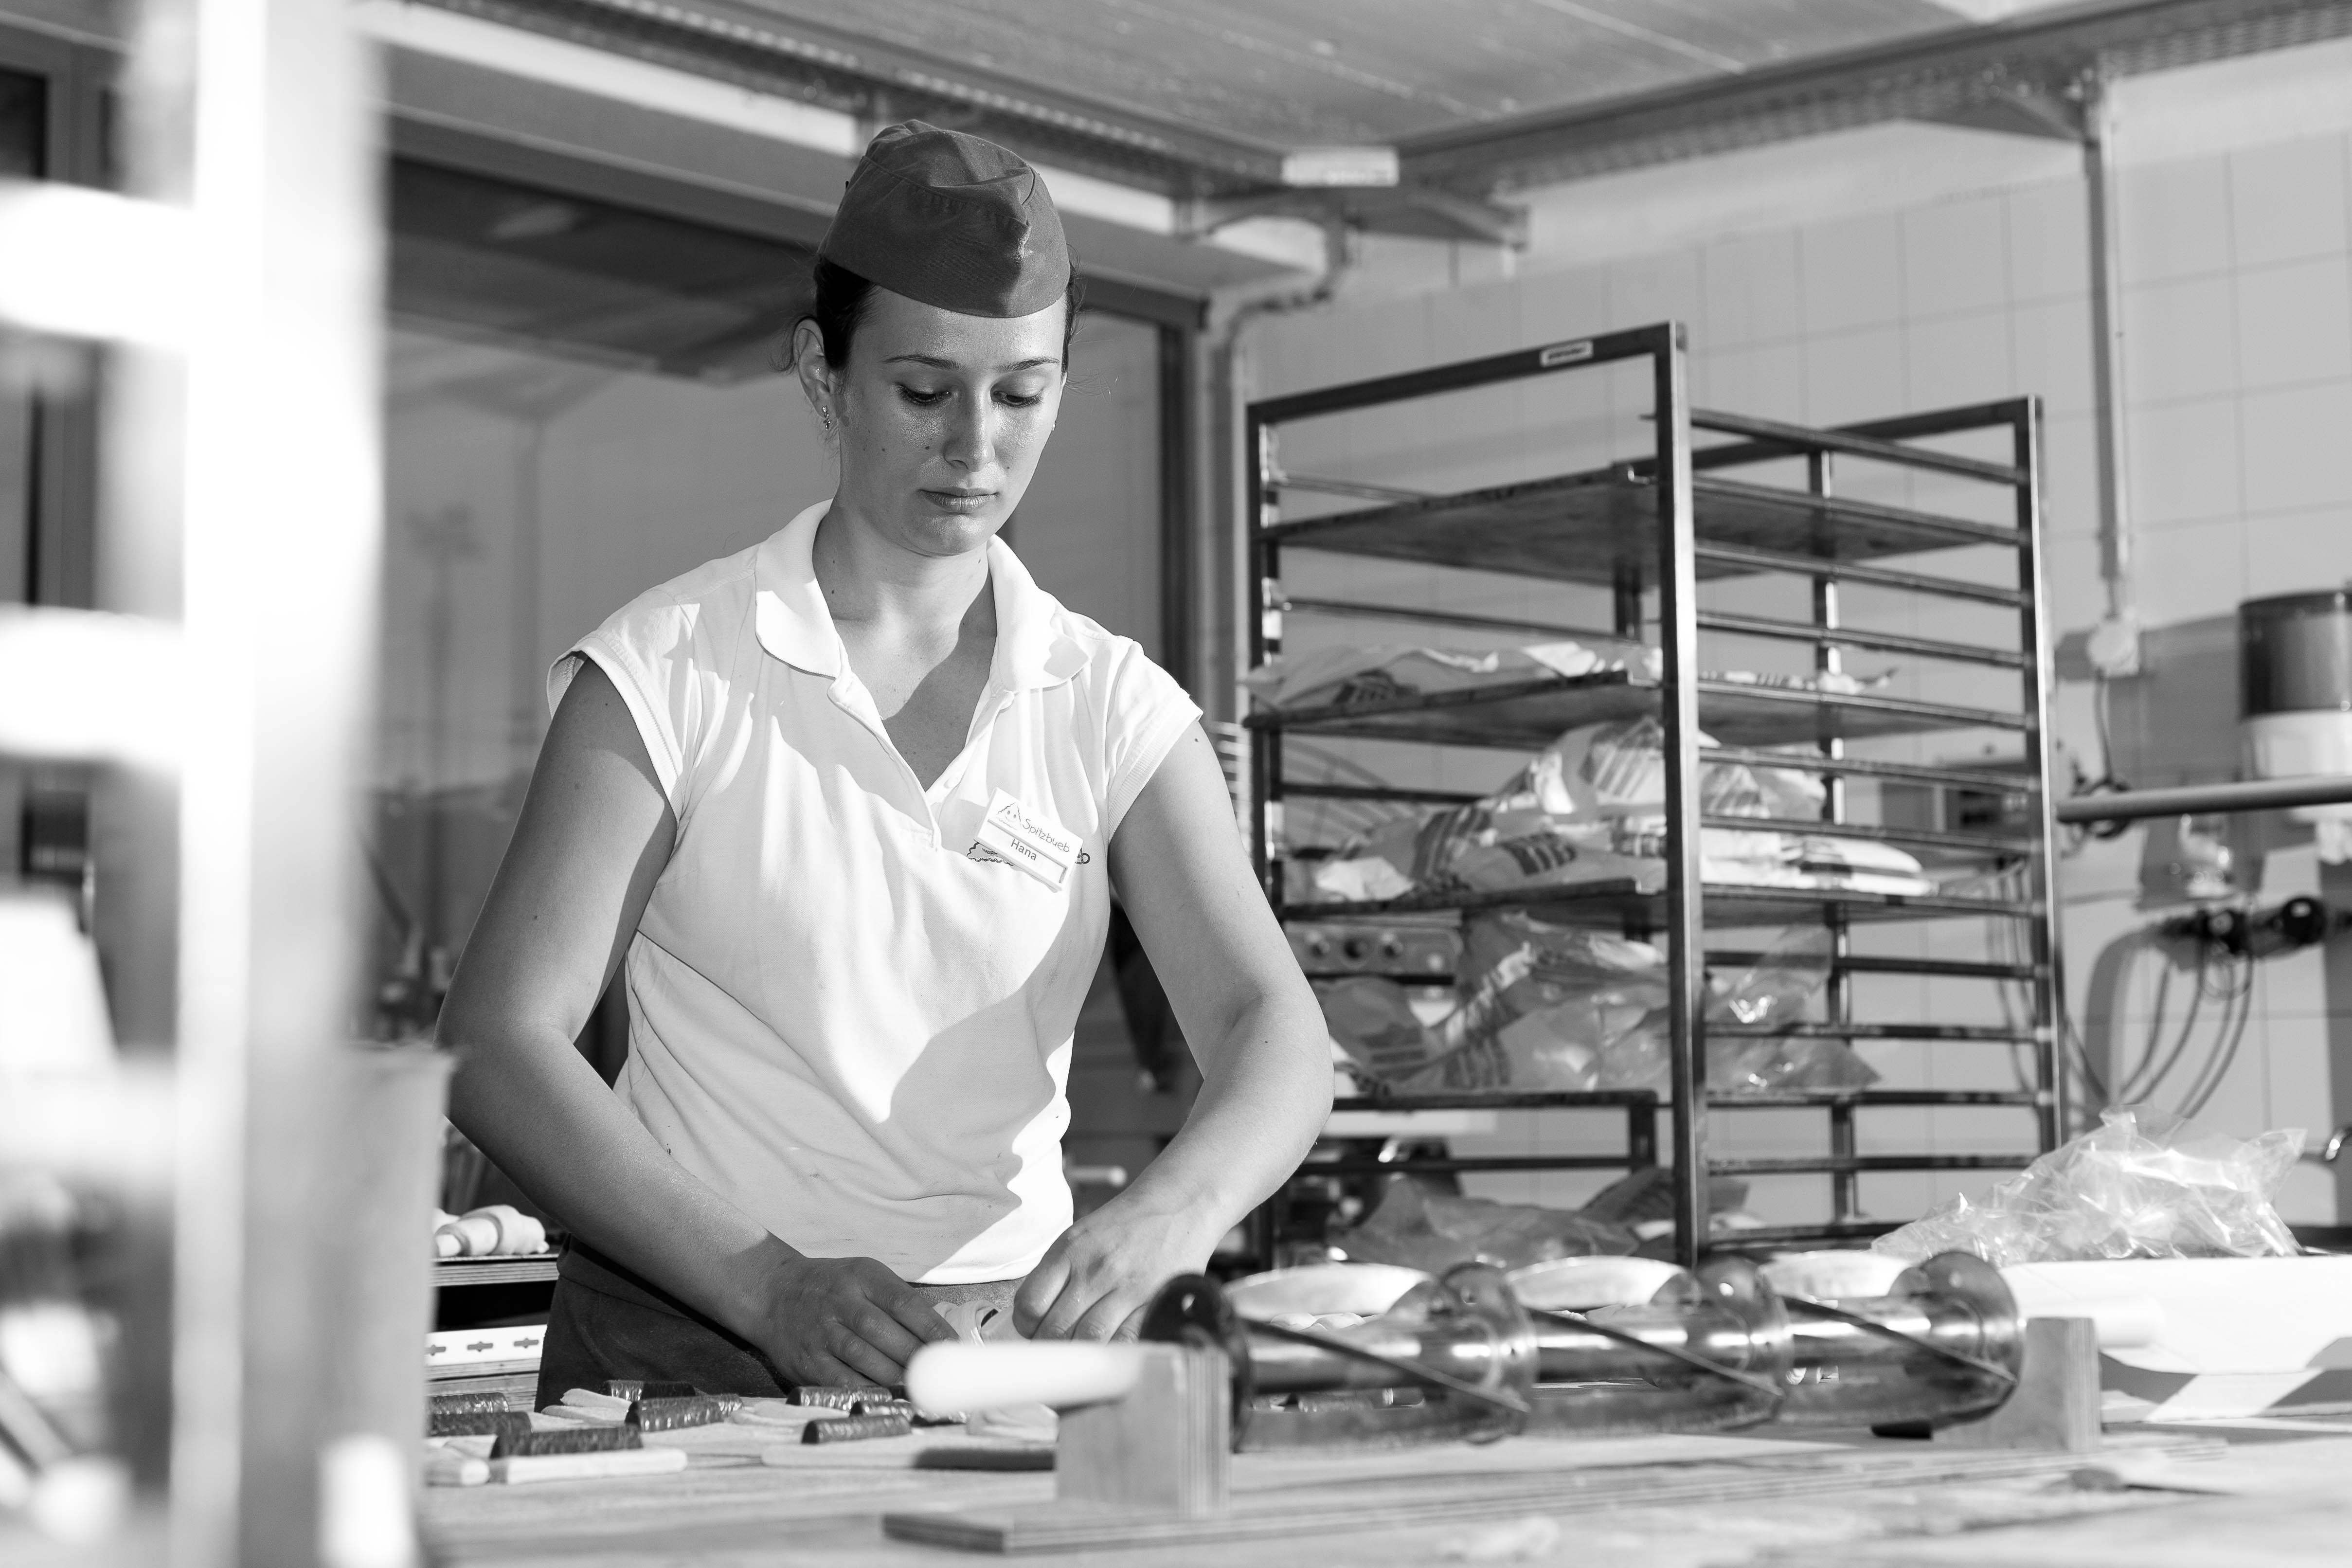 Bäckerei Spitzbub